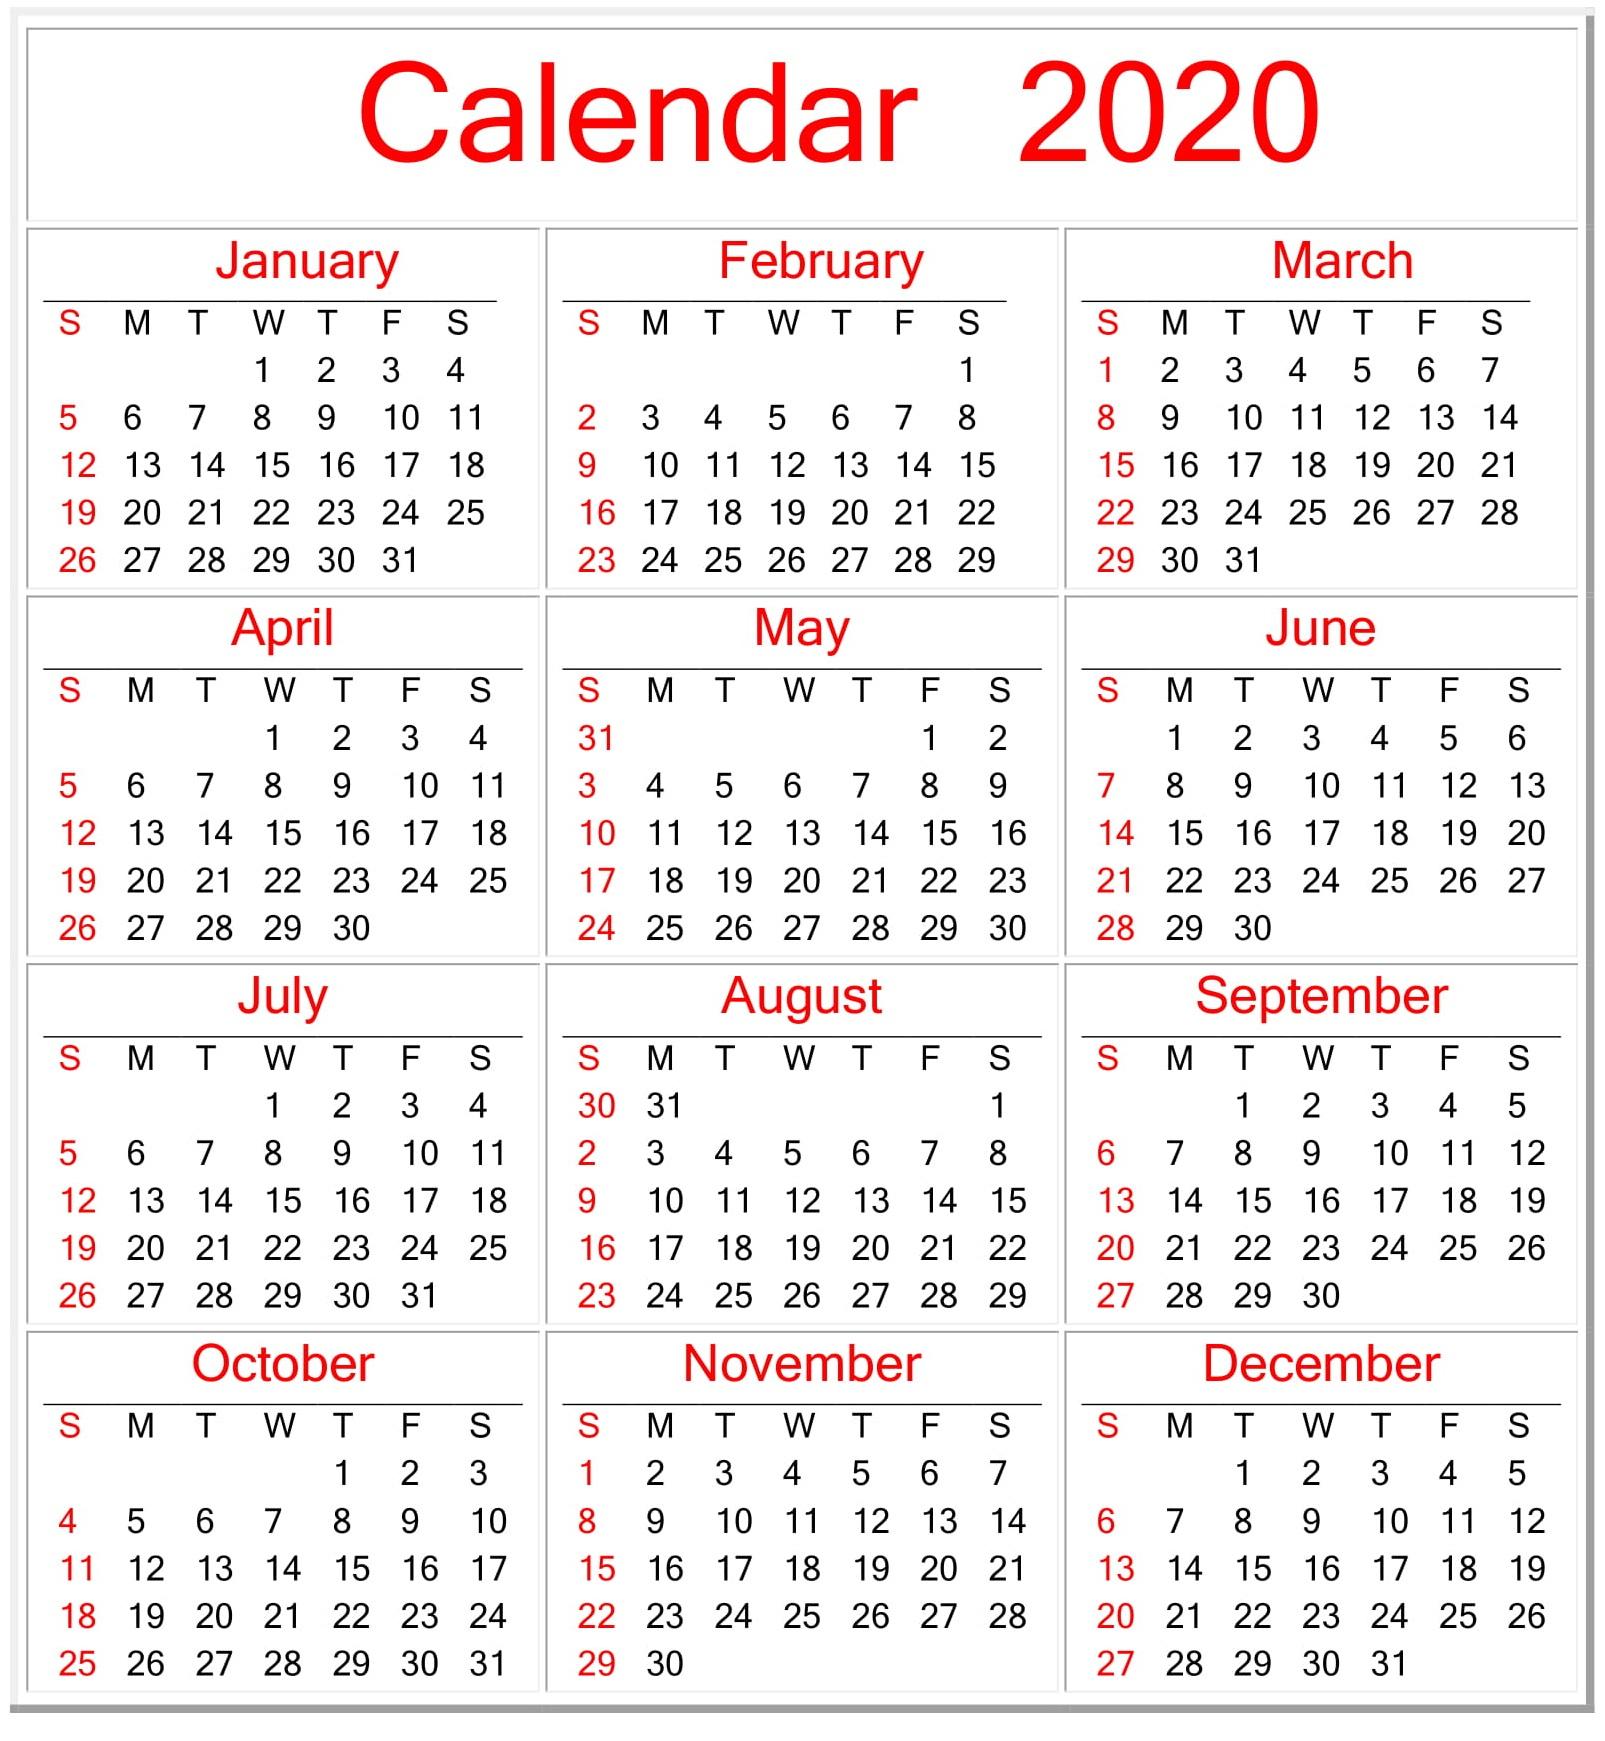 Printable Calendar 2020 Pdf Template – Free Latest Calendar inside Free Printable 2020 Employee Attendance Calendar